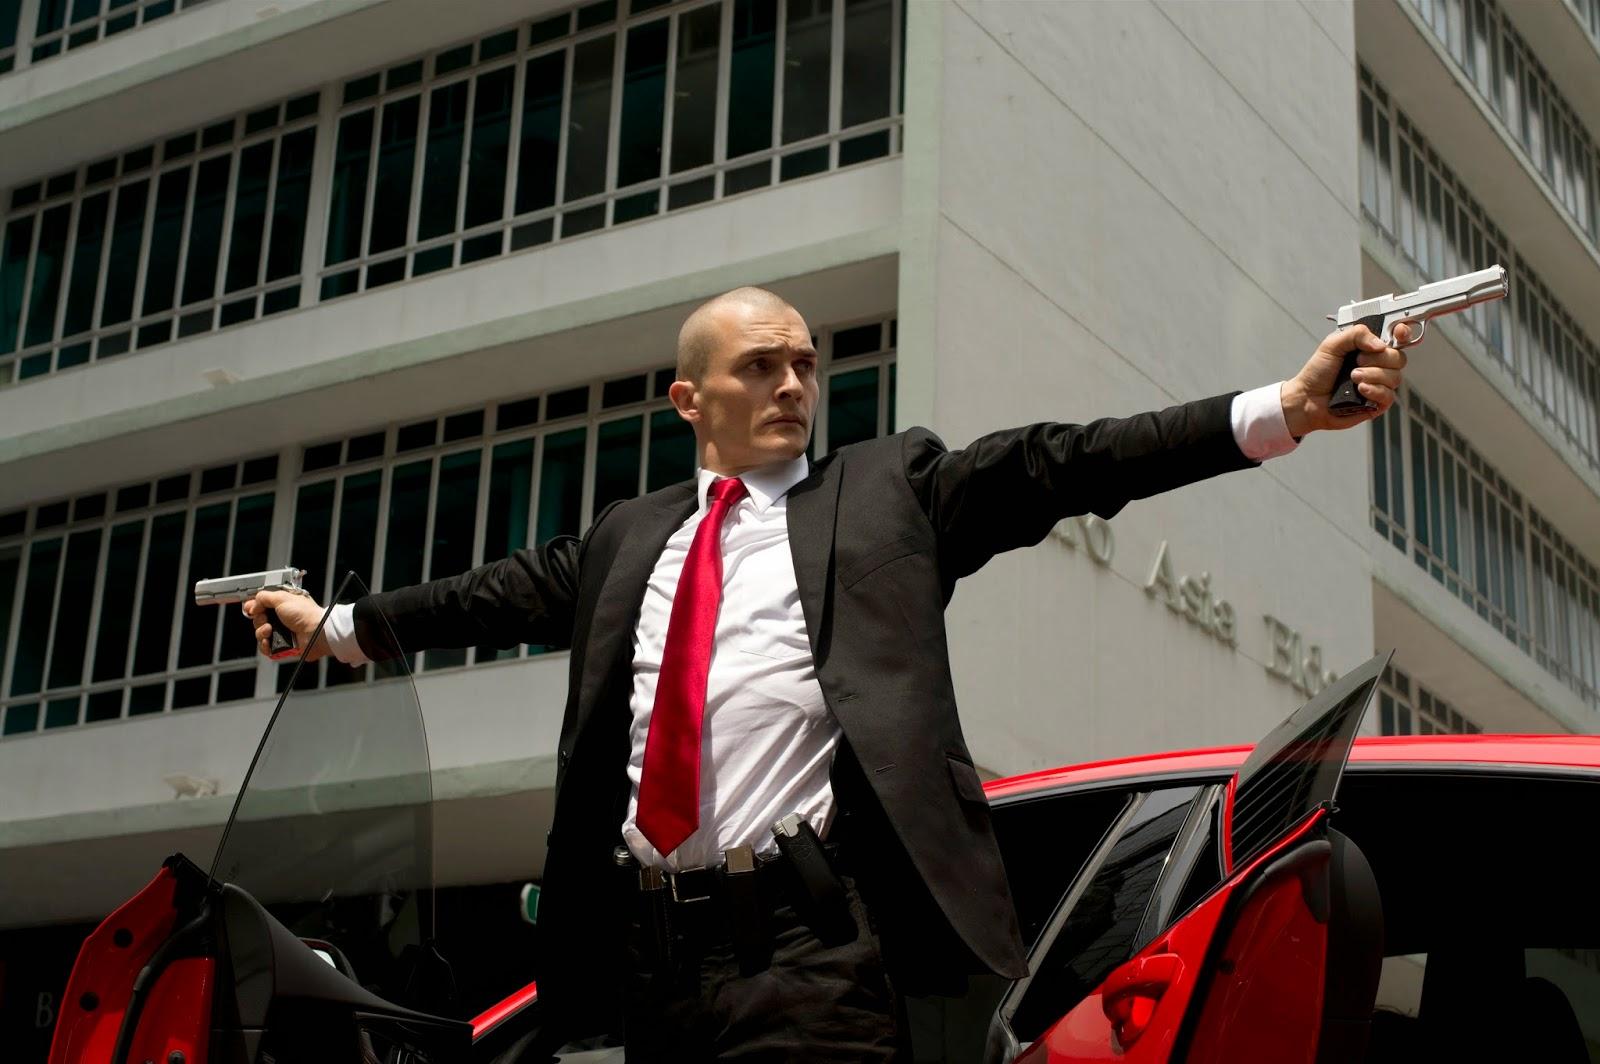 Agent 47 release date in Australia